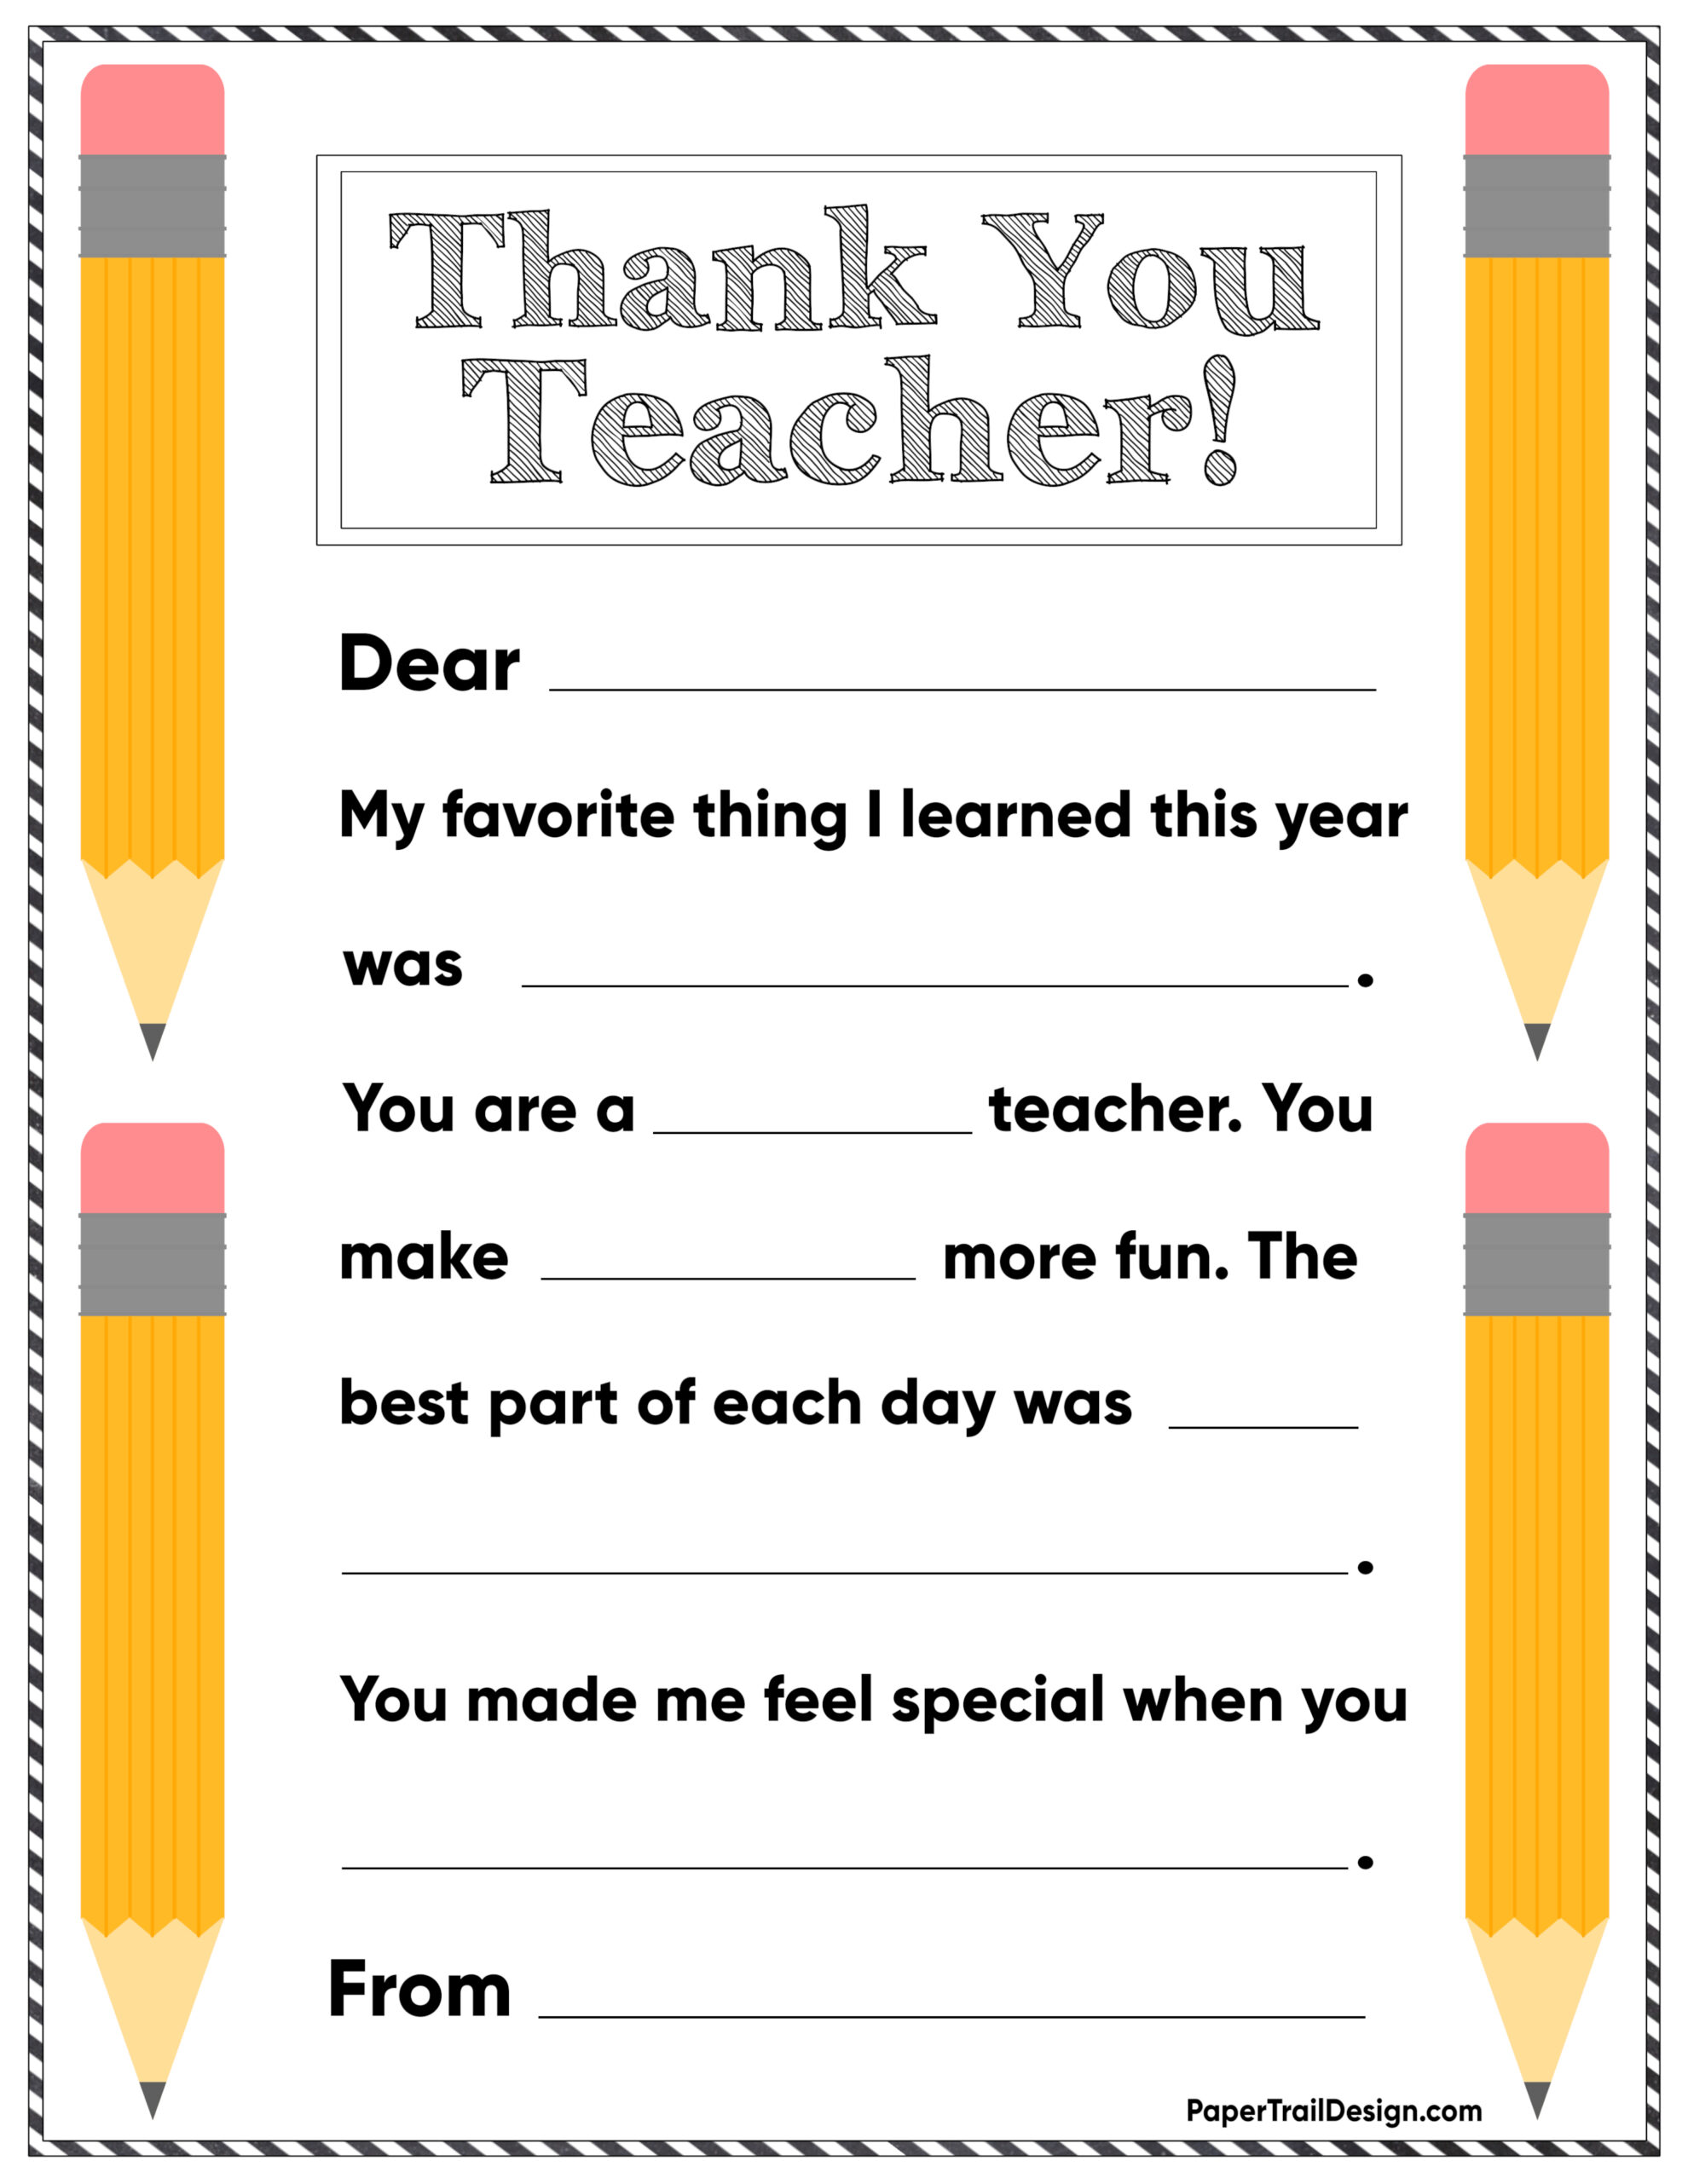 Free Printable Thank You Card Teacher  Paper Trail Design Inside Thank You Card For Teacher Template